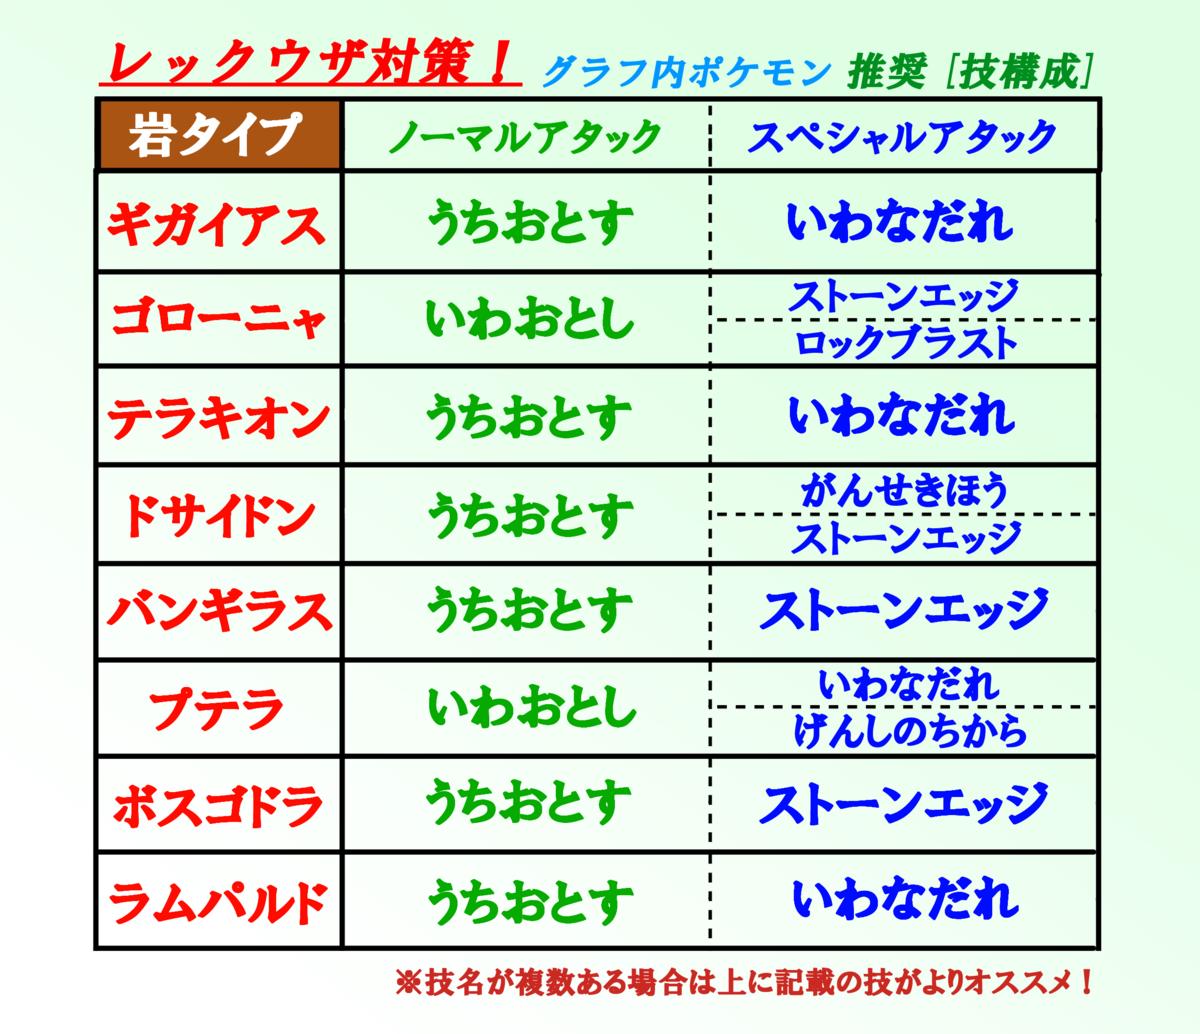 f:id:Kazumin0331:20200731231753p:plain